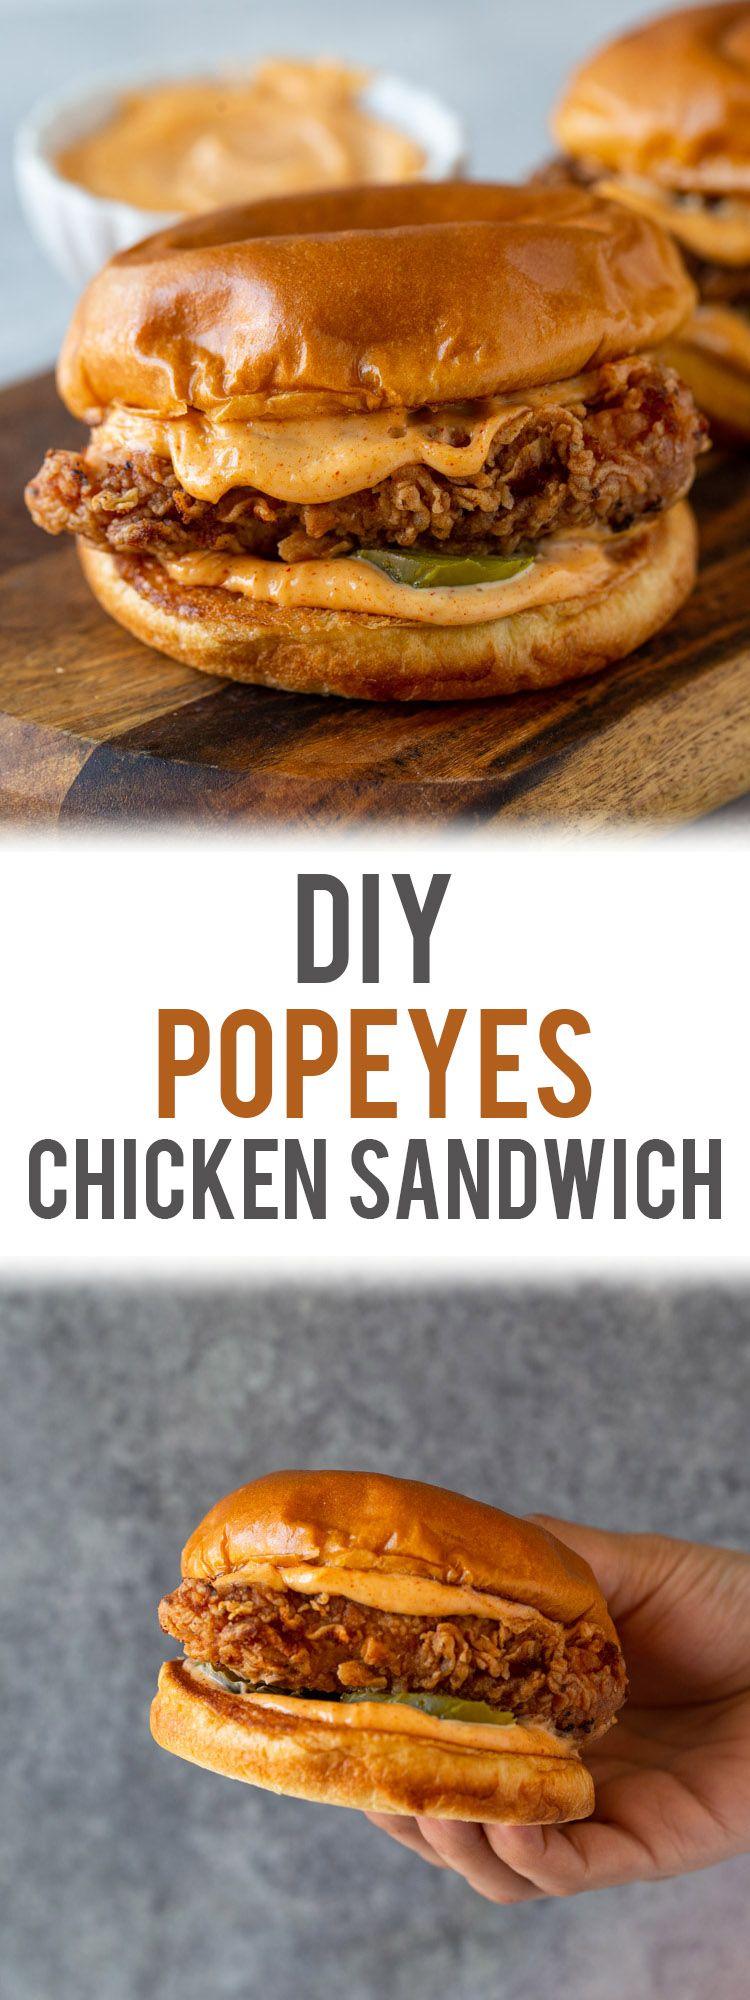 Photo of DIY Popeyes Chicken Sandwich